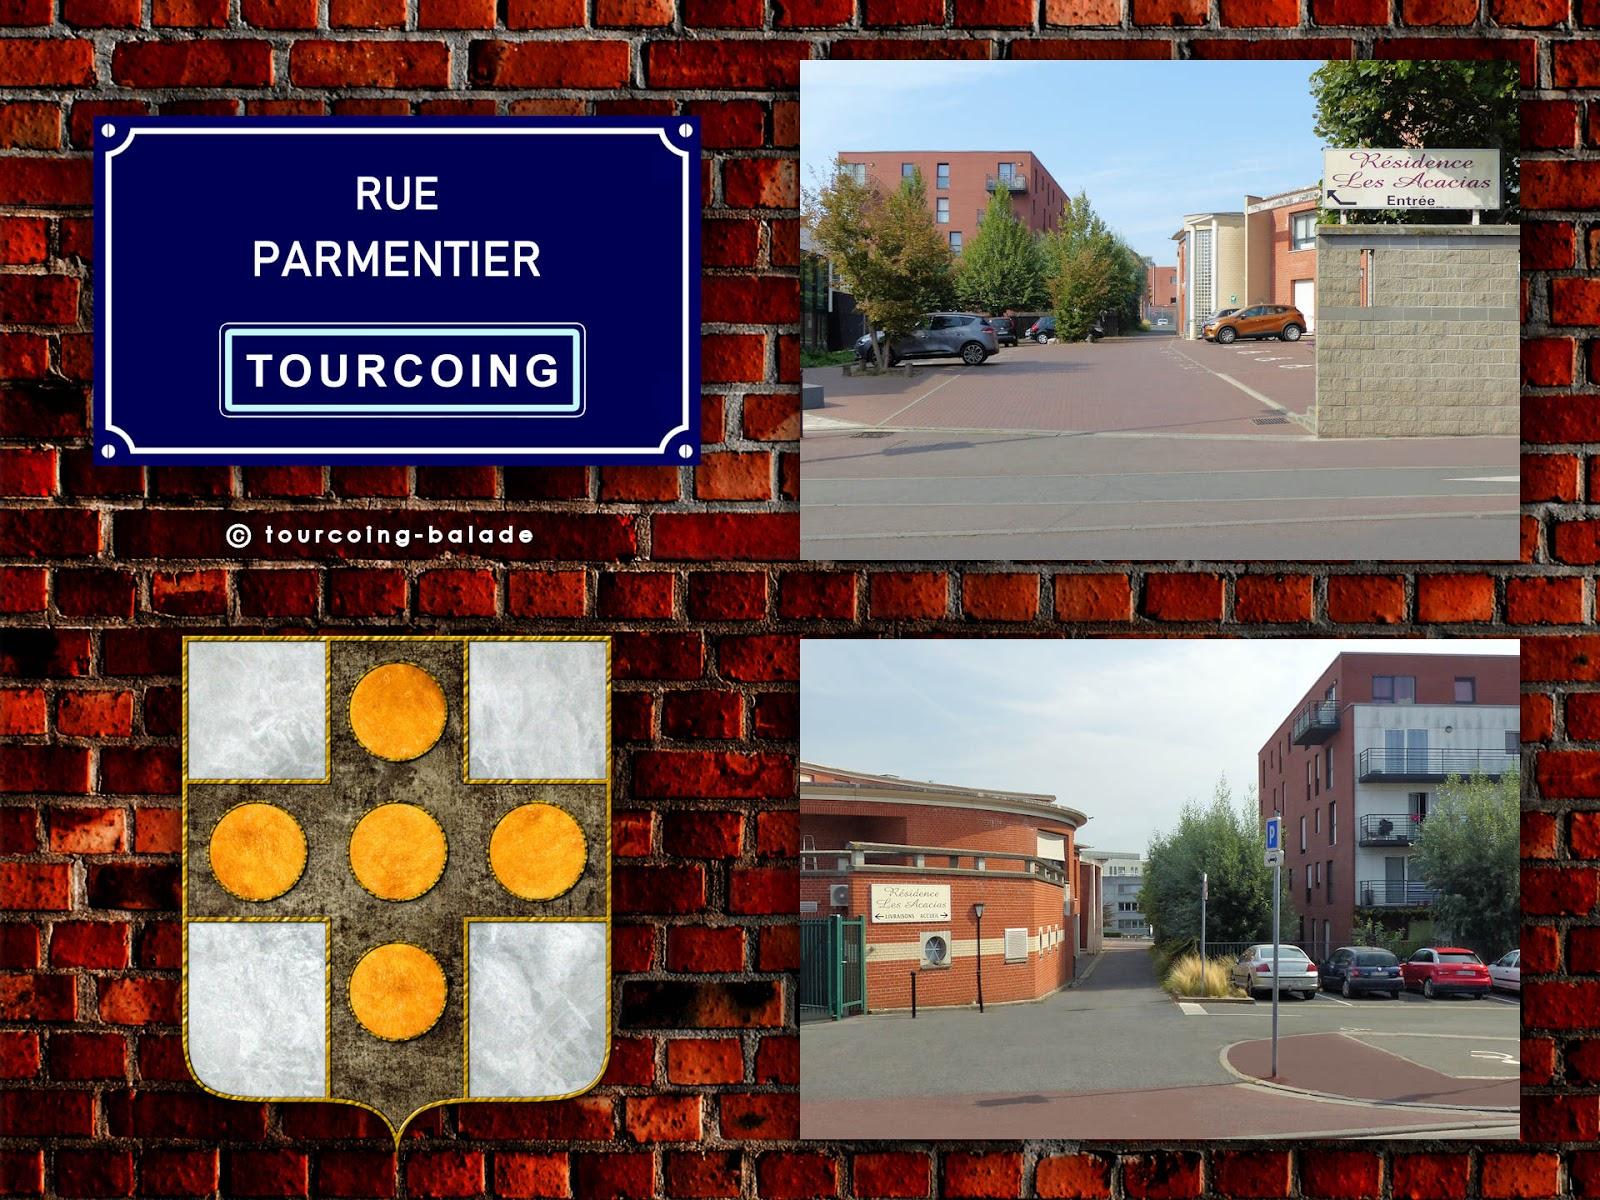 Rues de Tourcoing - Rue Parmentier.